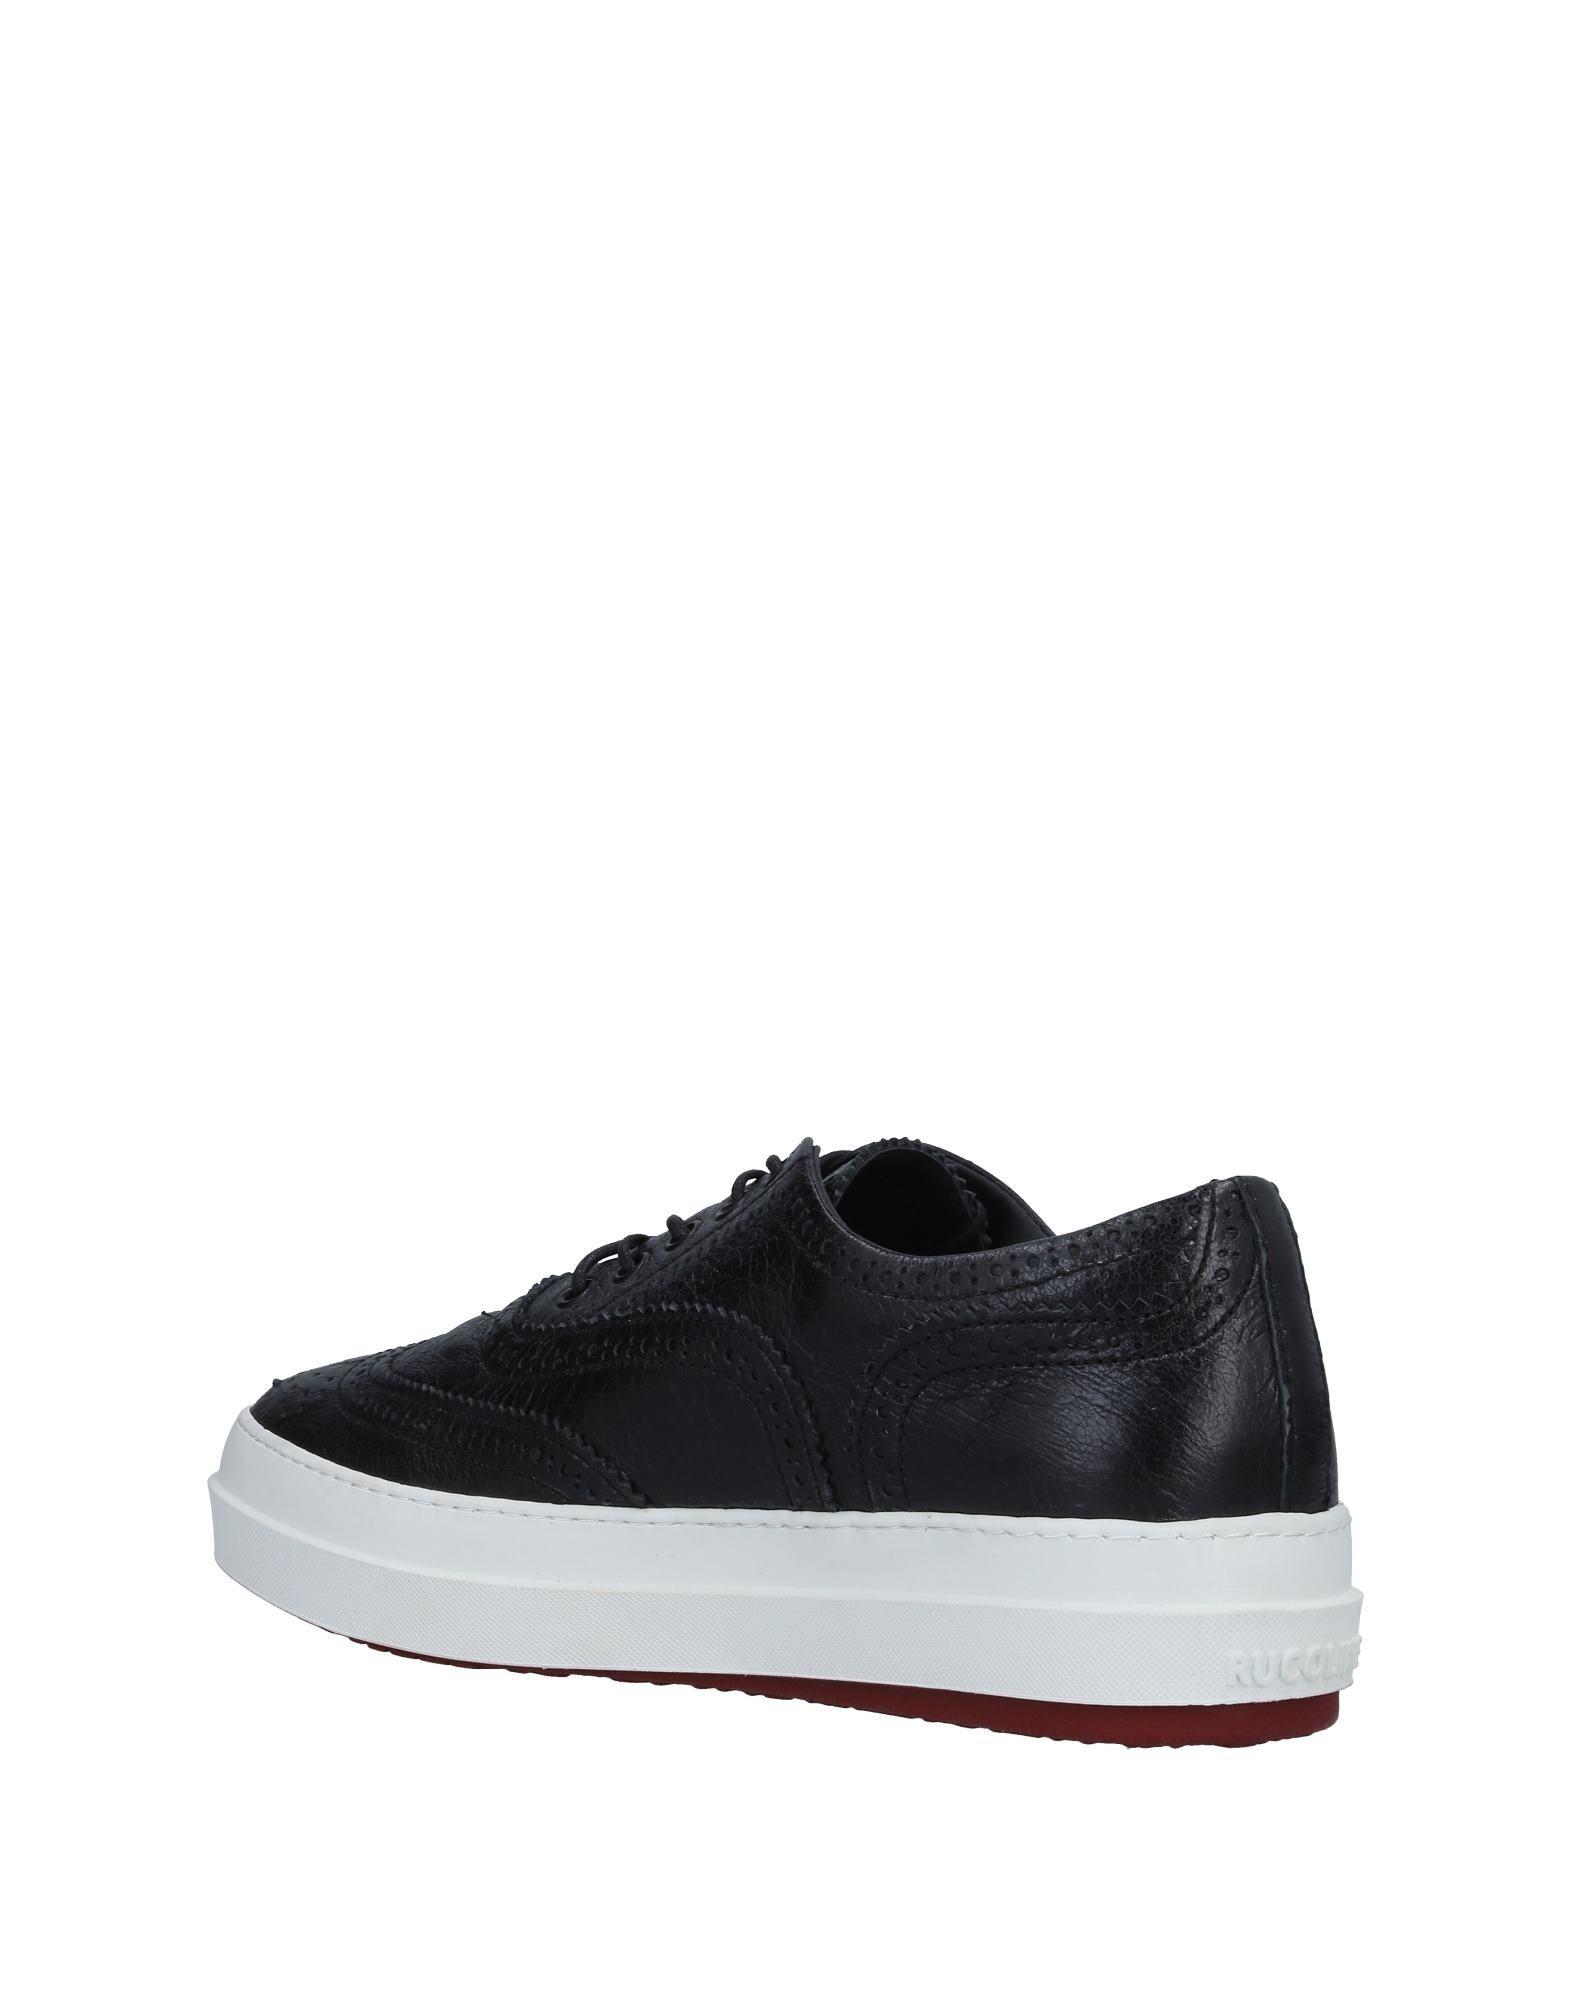 Ruco Line Sneakers Damen  Schuhe 11495859MX Gute Qualität beliebte Schuhe  bc979f